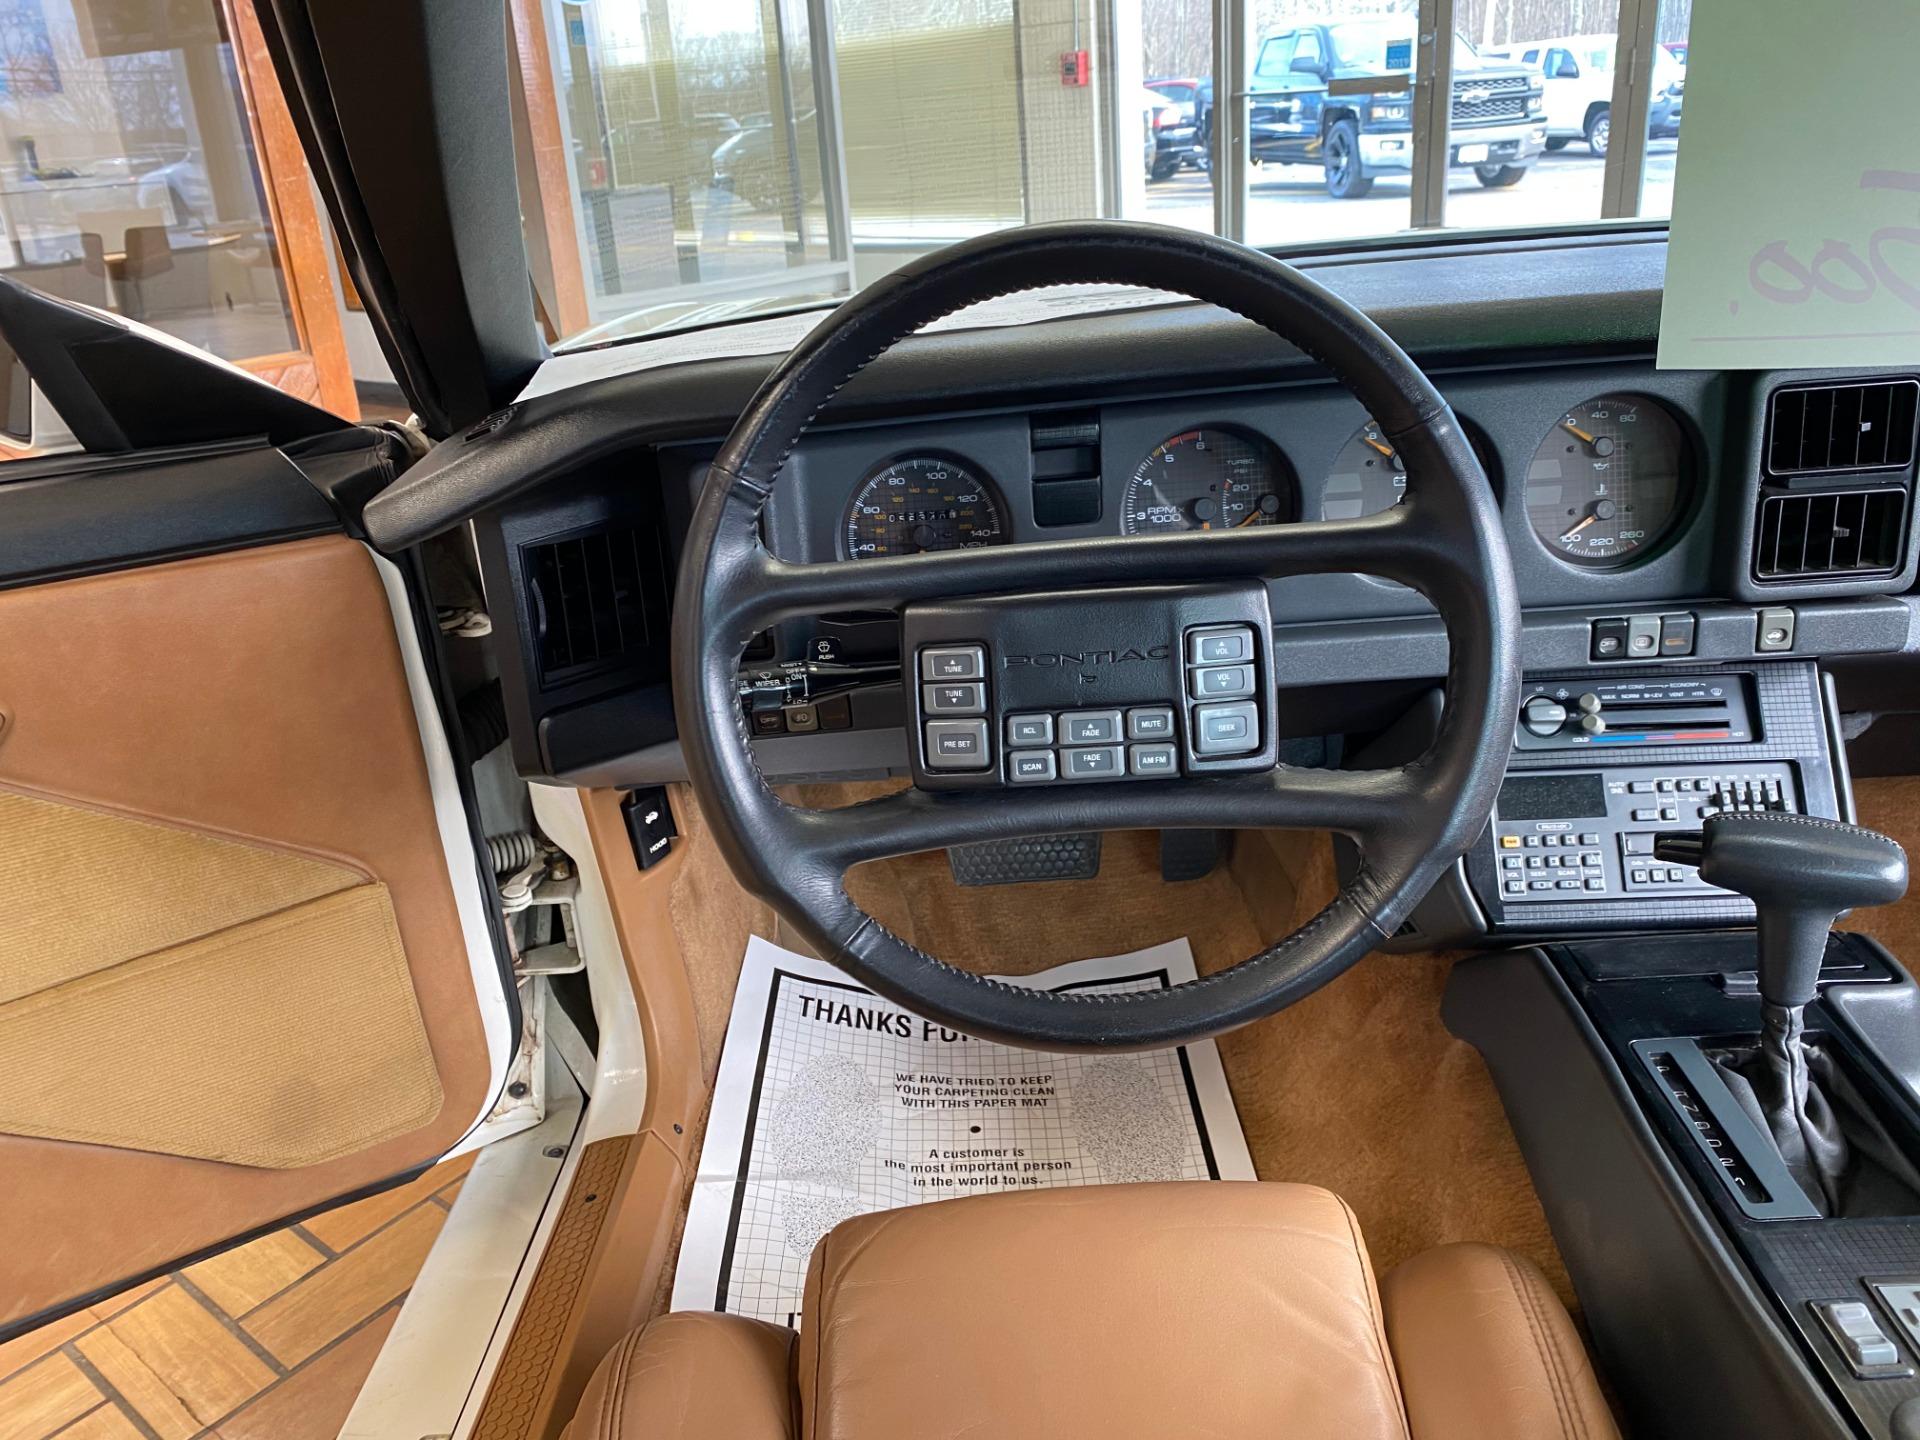 Used 1989 Pontiac Firebird Turbo Trans Am For Sale 23 888 Executive Auto Sales Stock 1748